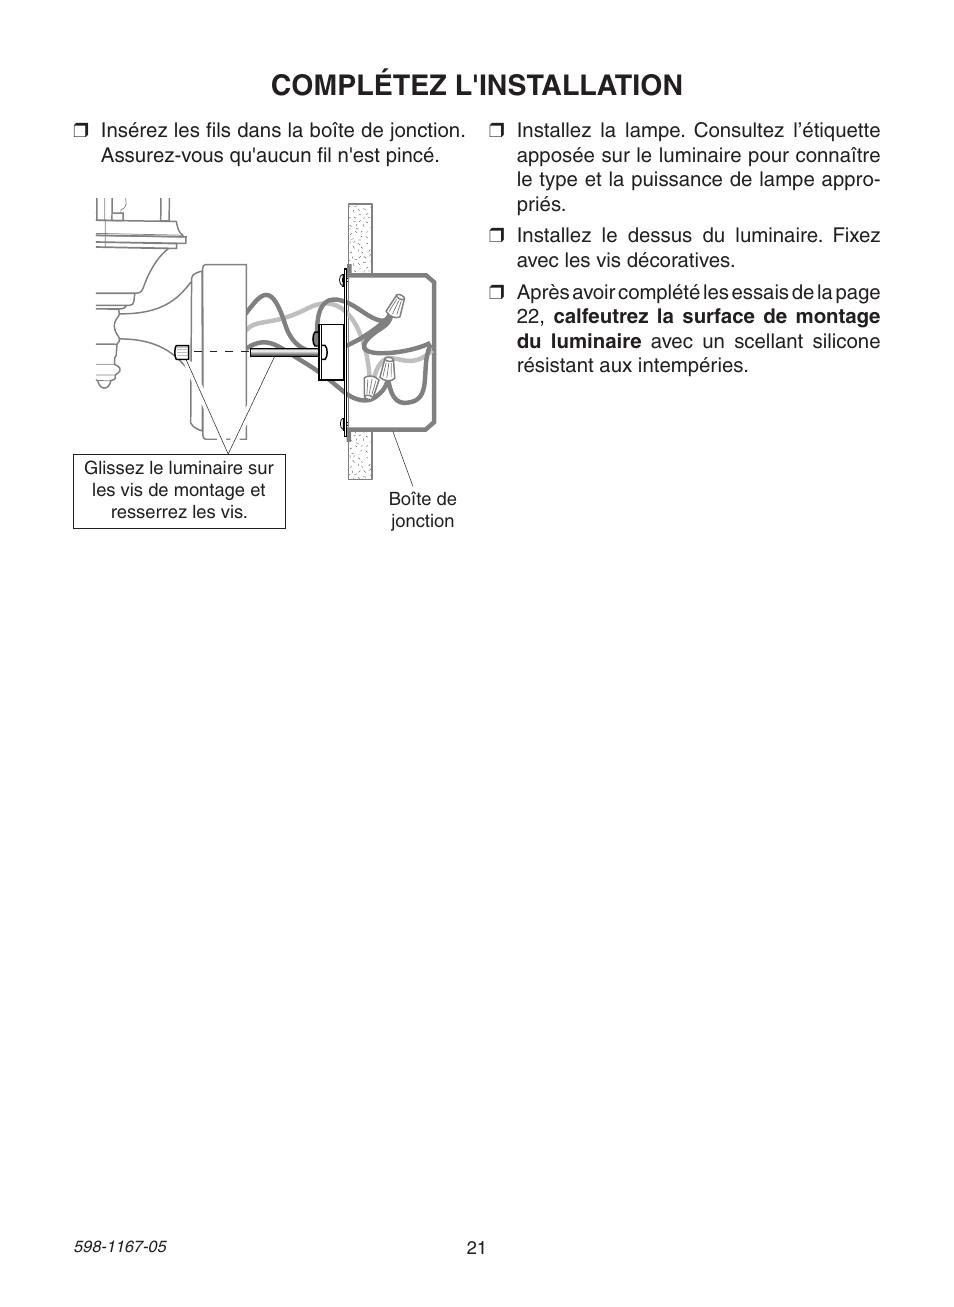 compl tez l installation heath zenith dualbrite pf 4192 bk user rh manualsdir com